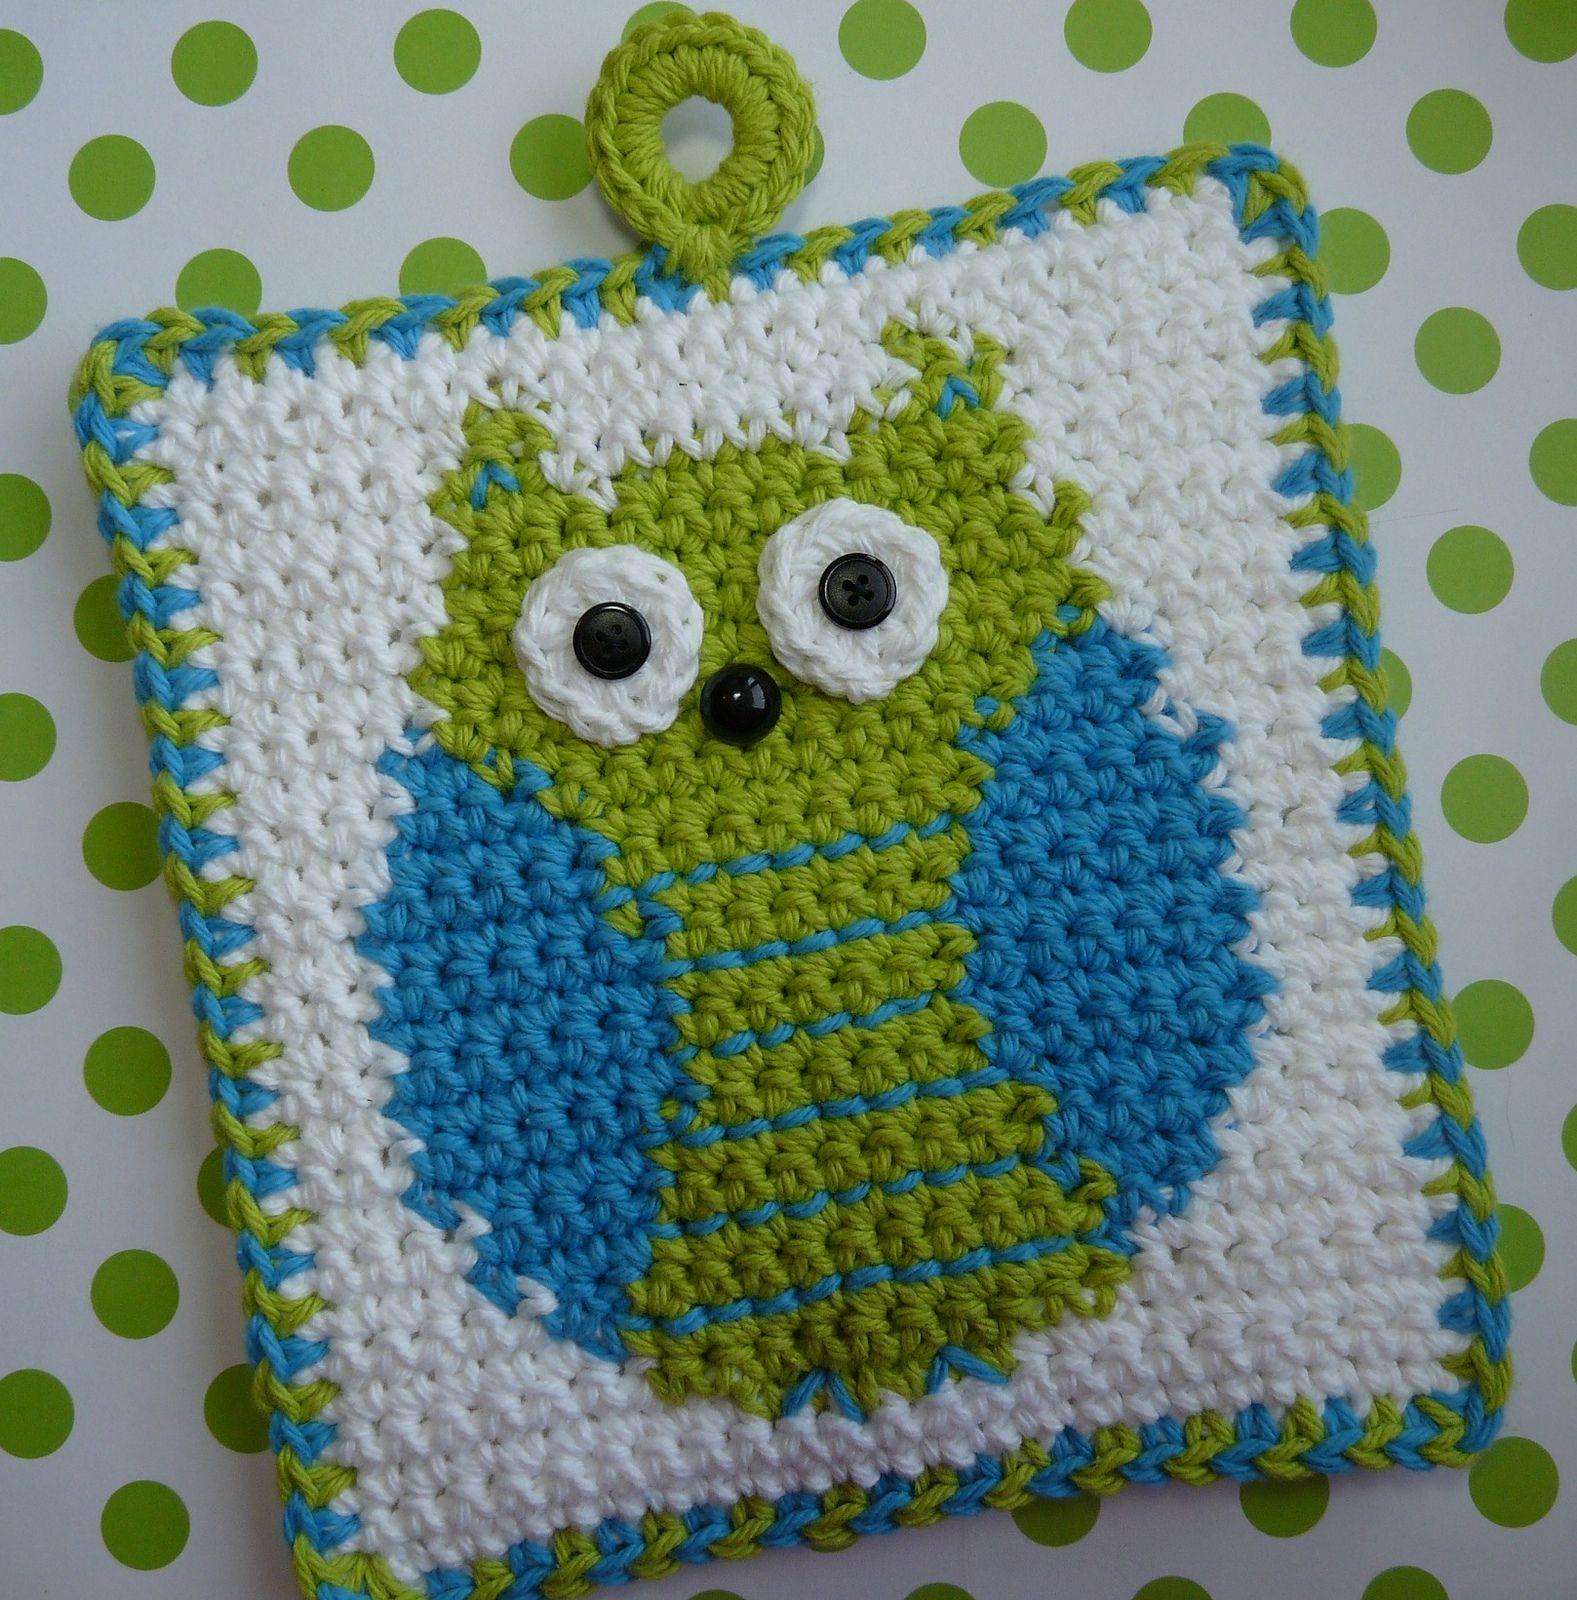 Ravelry: It\'s a Hoot! Owl Potholder by Doni Speigle | crochet owls ...